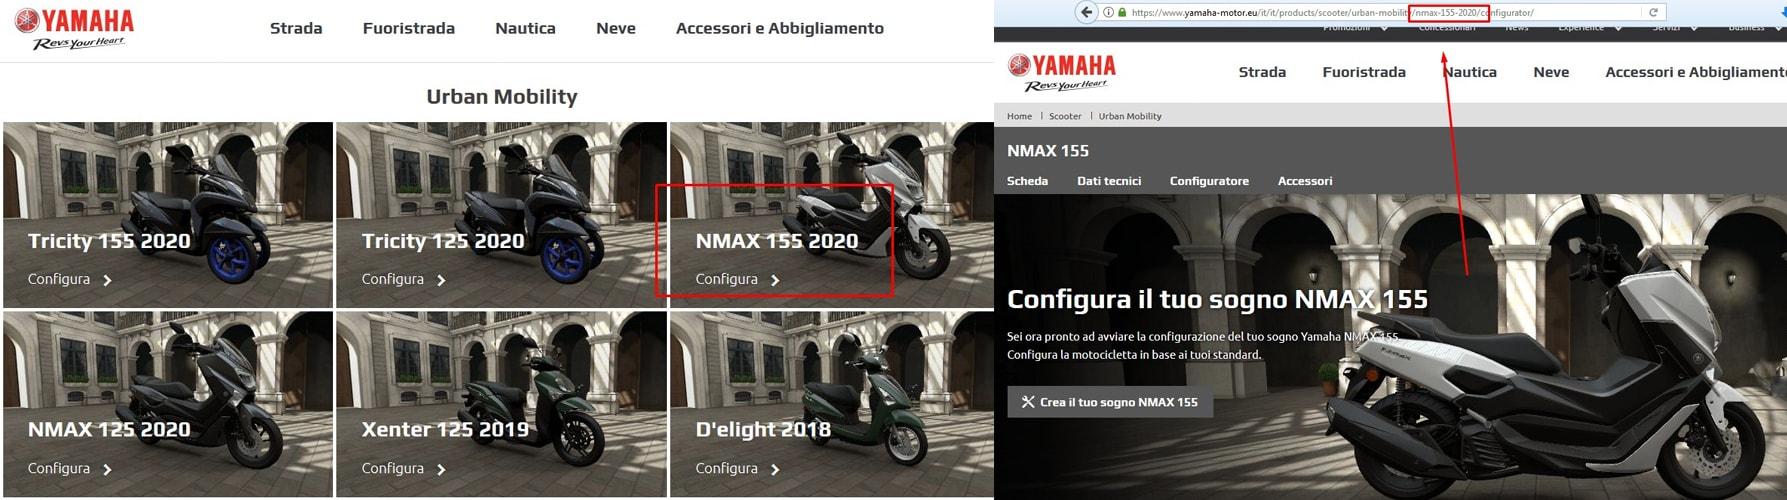 Nmax 155 2020